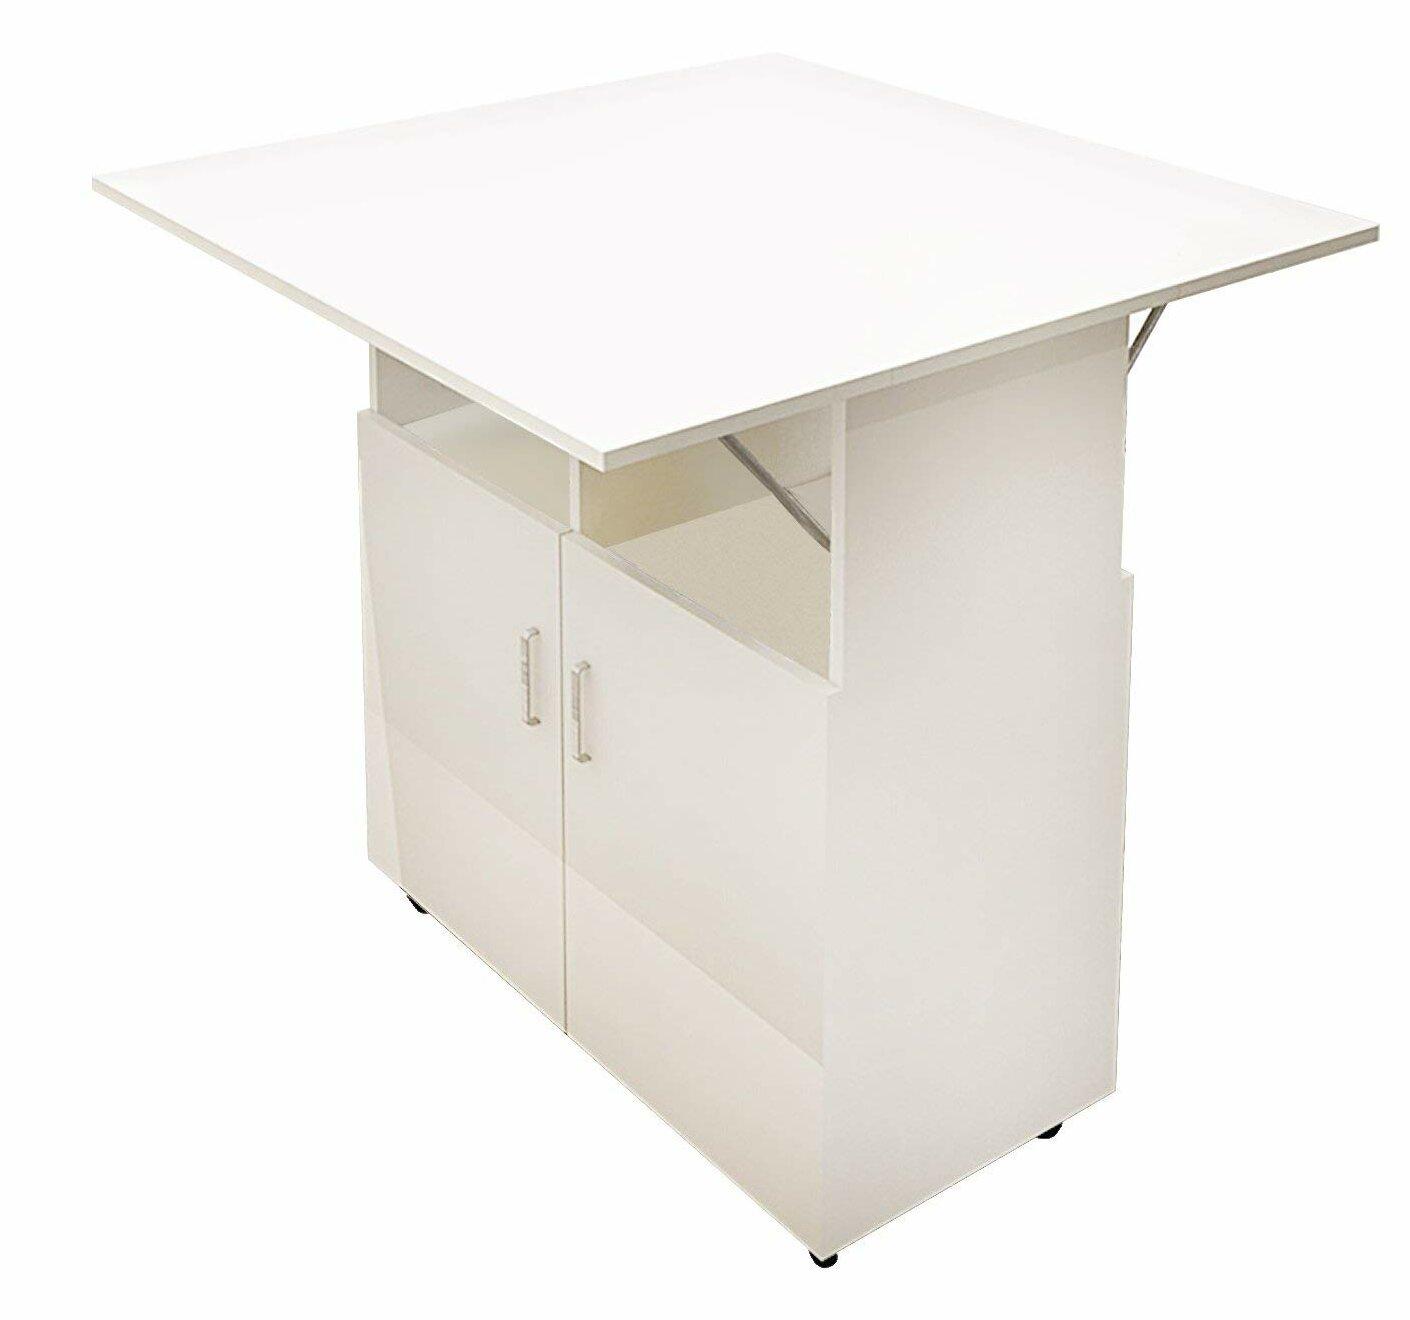 Ebern Designs Caspian Foldable Dining Table & Reviews | Wayfair on